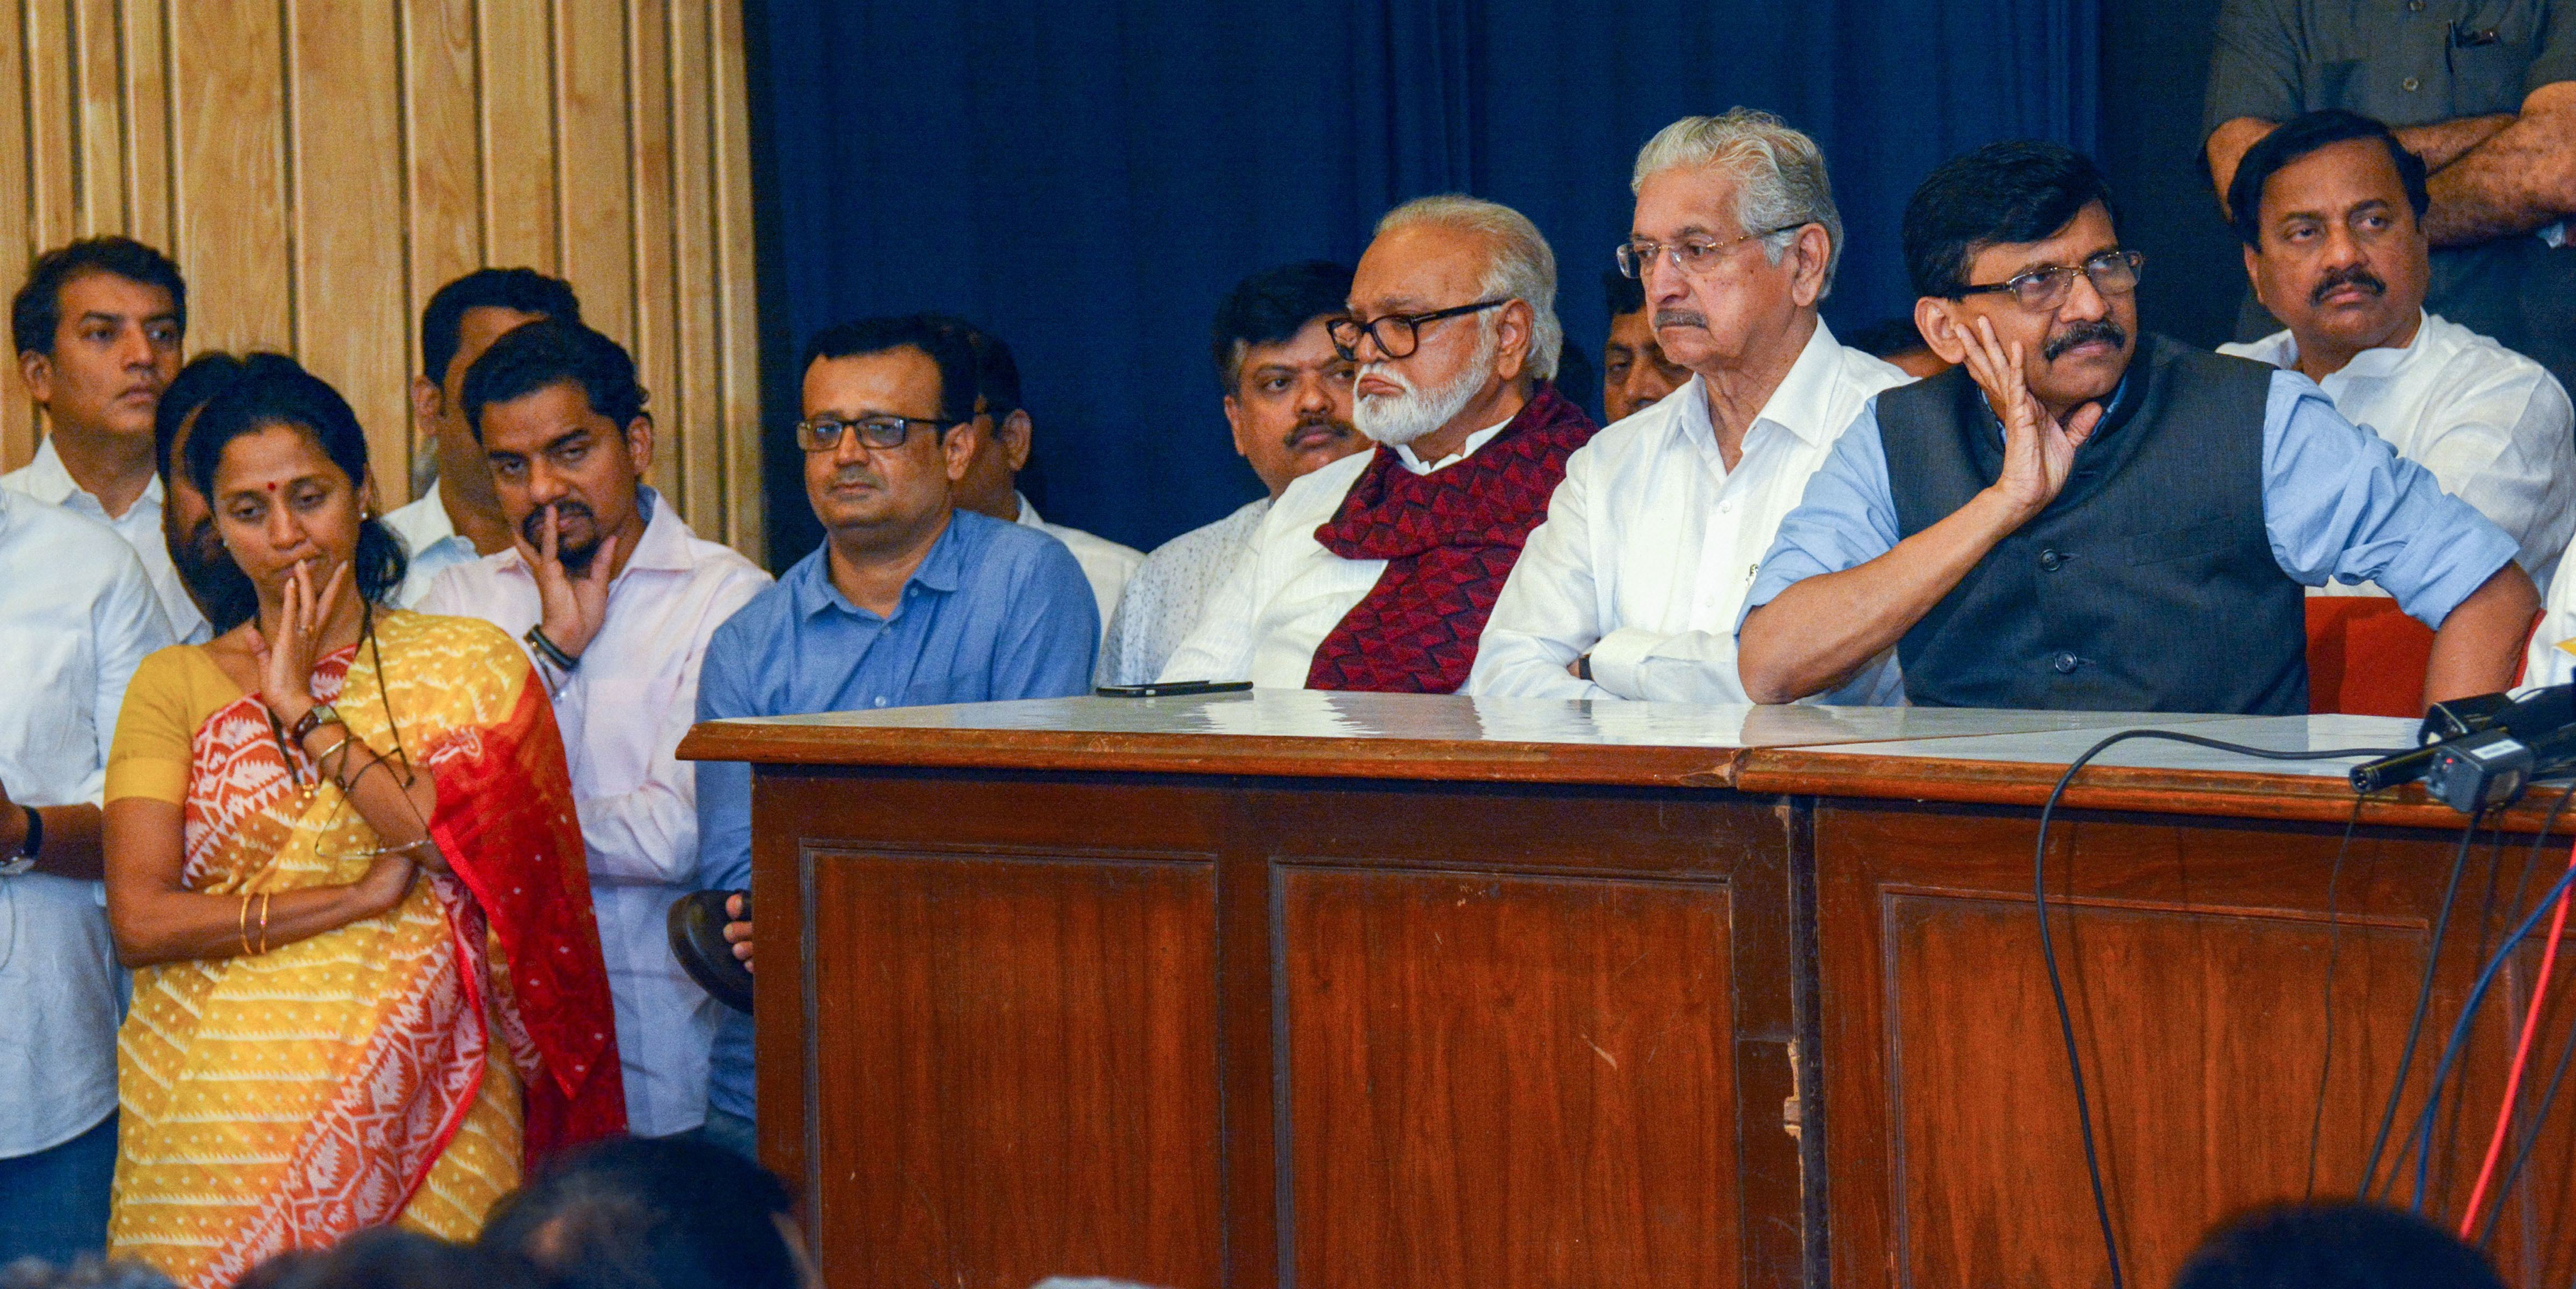 NCP's Supriya Sule, Sunil Tatkare and Chhagan Bhujbal with Sena leader Subhash Desai and Sanjay Raut during a joint press conference, in Mumbai, Saturday, Nov. 23, 2019.